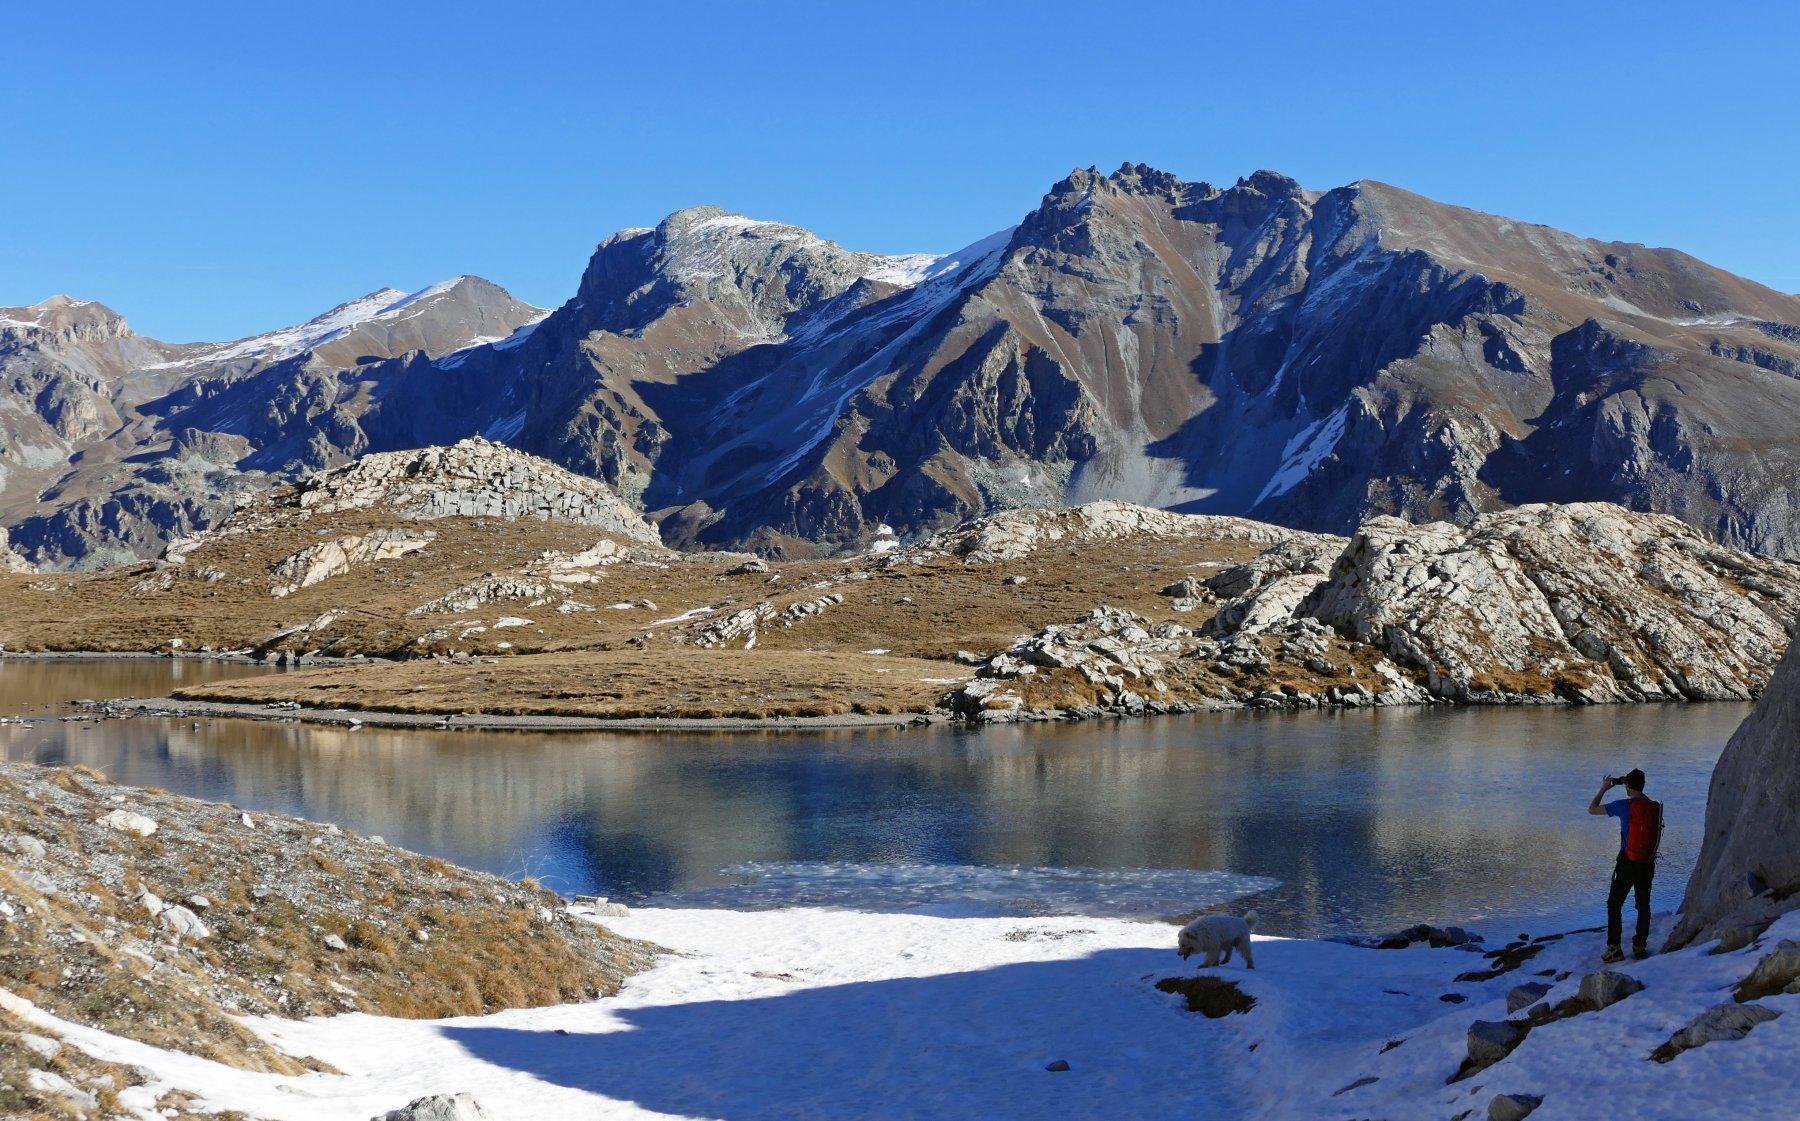 Salendo breve sosta fotografica al lago Niera